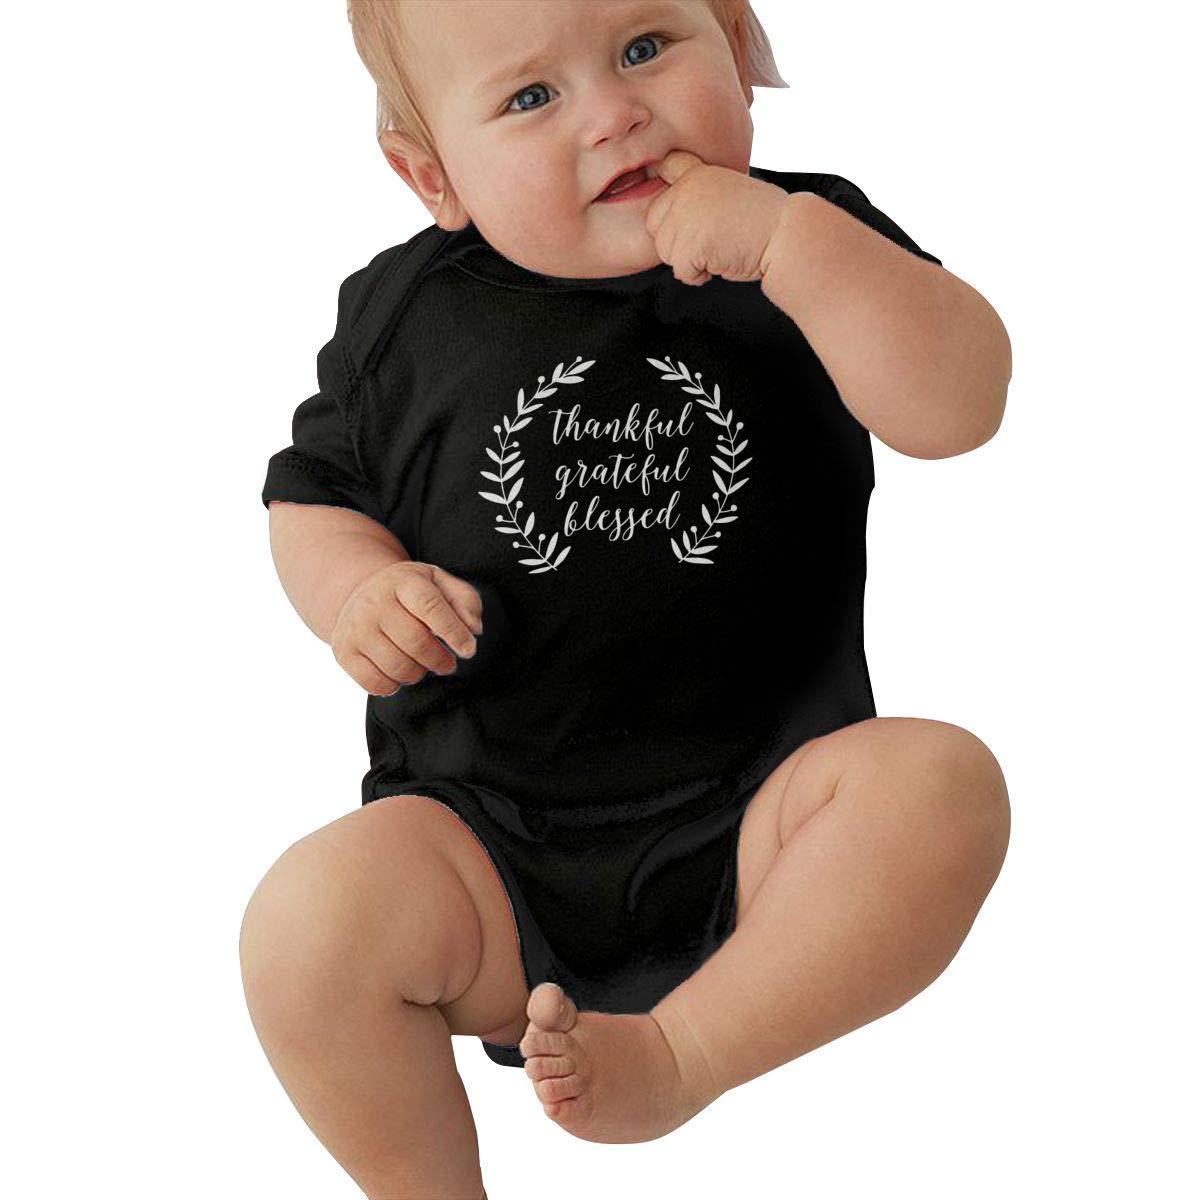 Mri-le2 Baby Girls Short Sleeve Jumper Bodysuit Thankful Grateful Blessed Infant Romper Jumpsuit